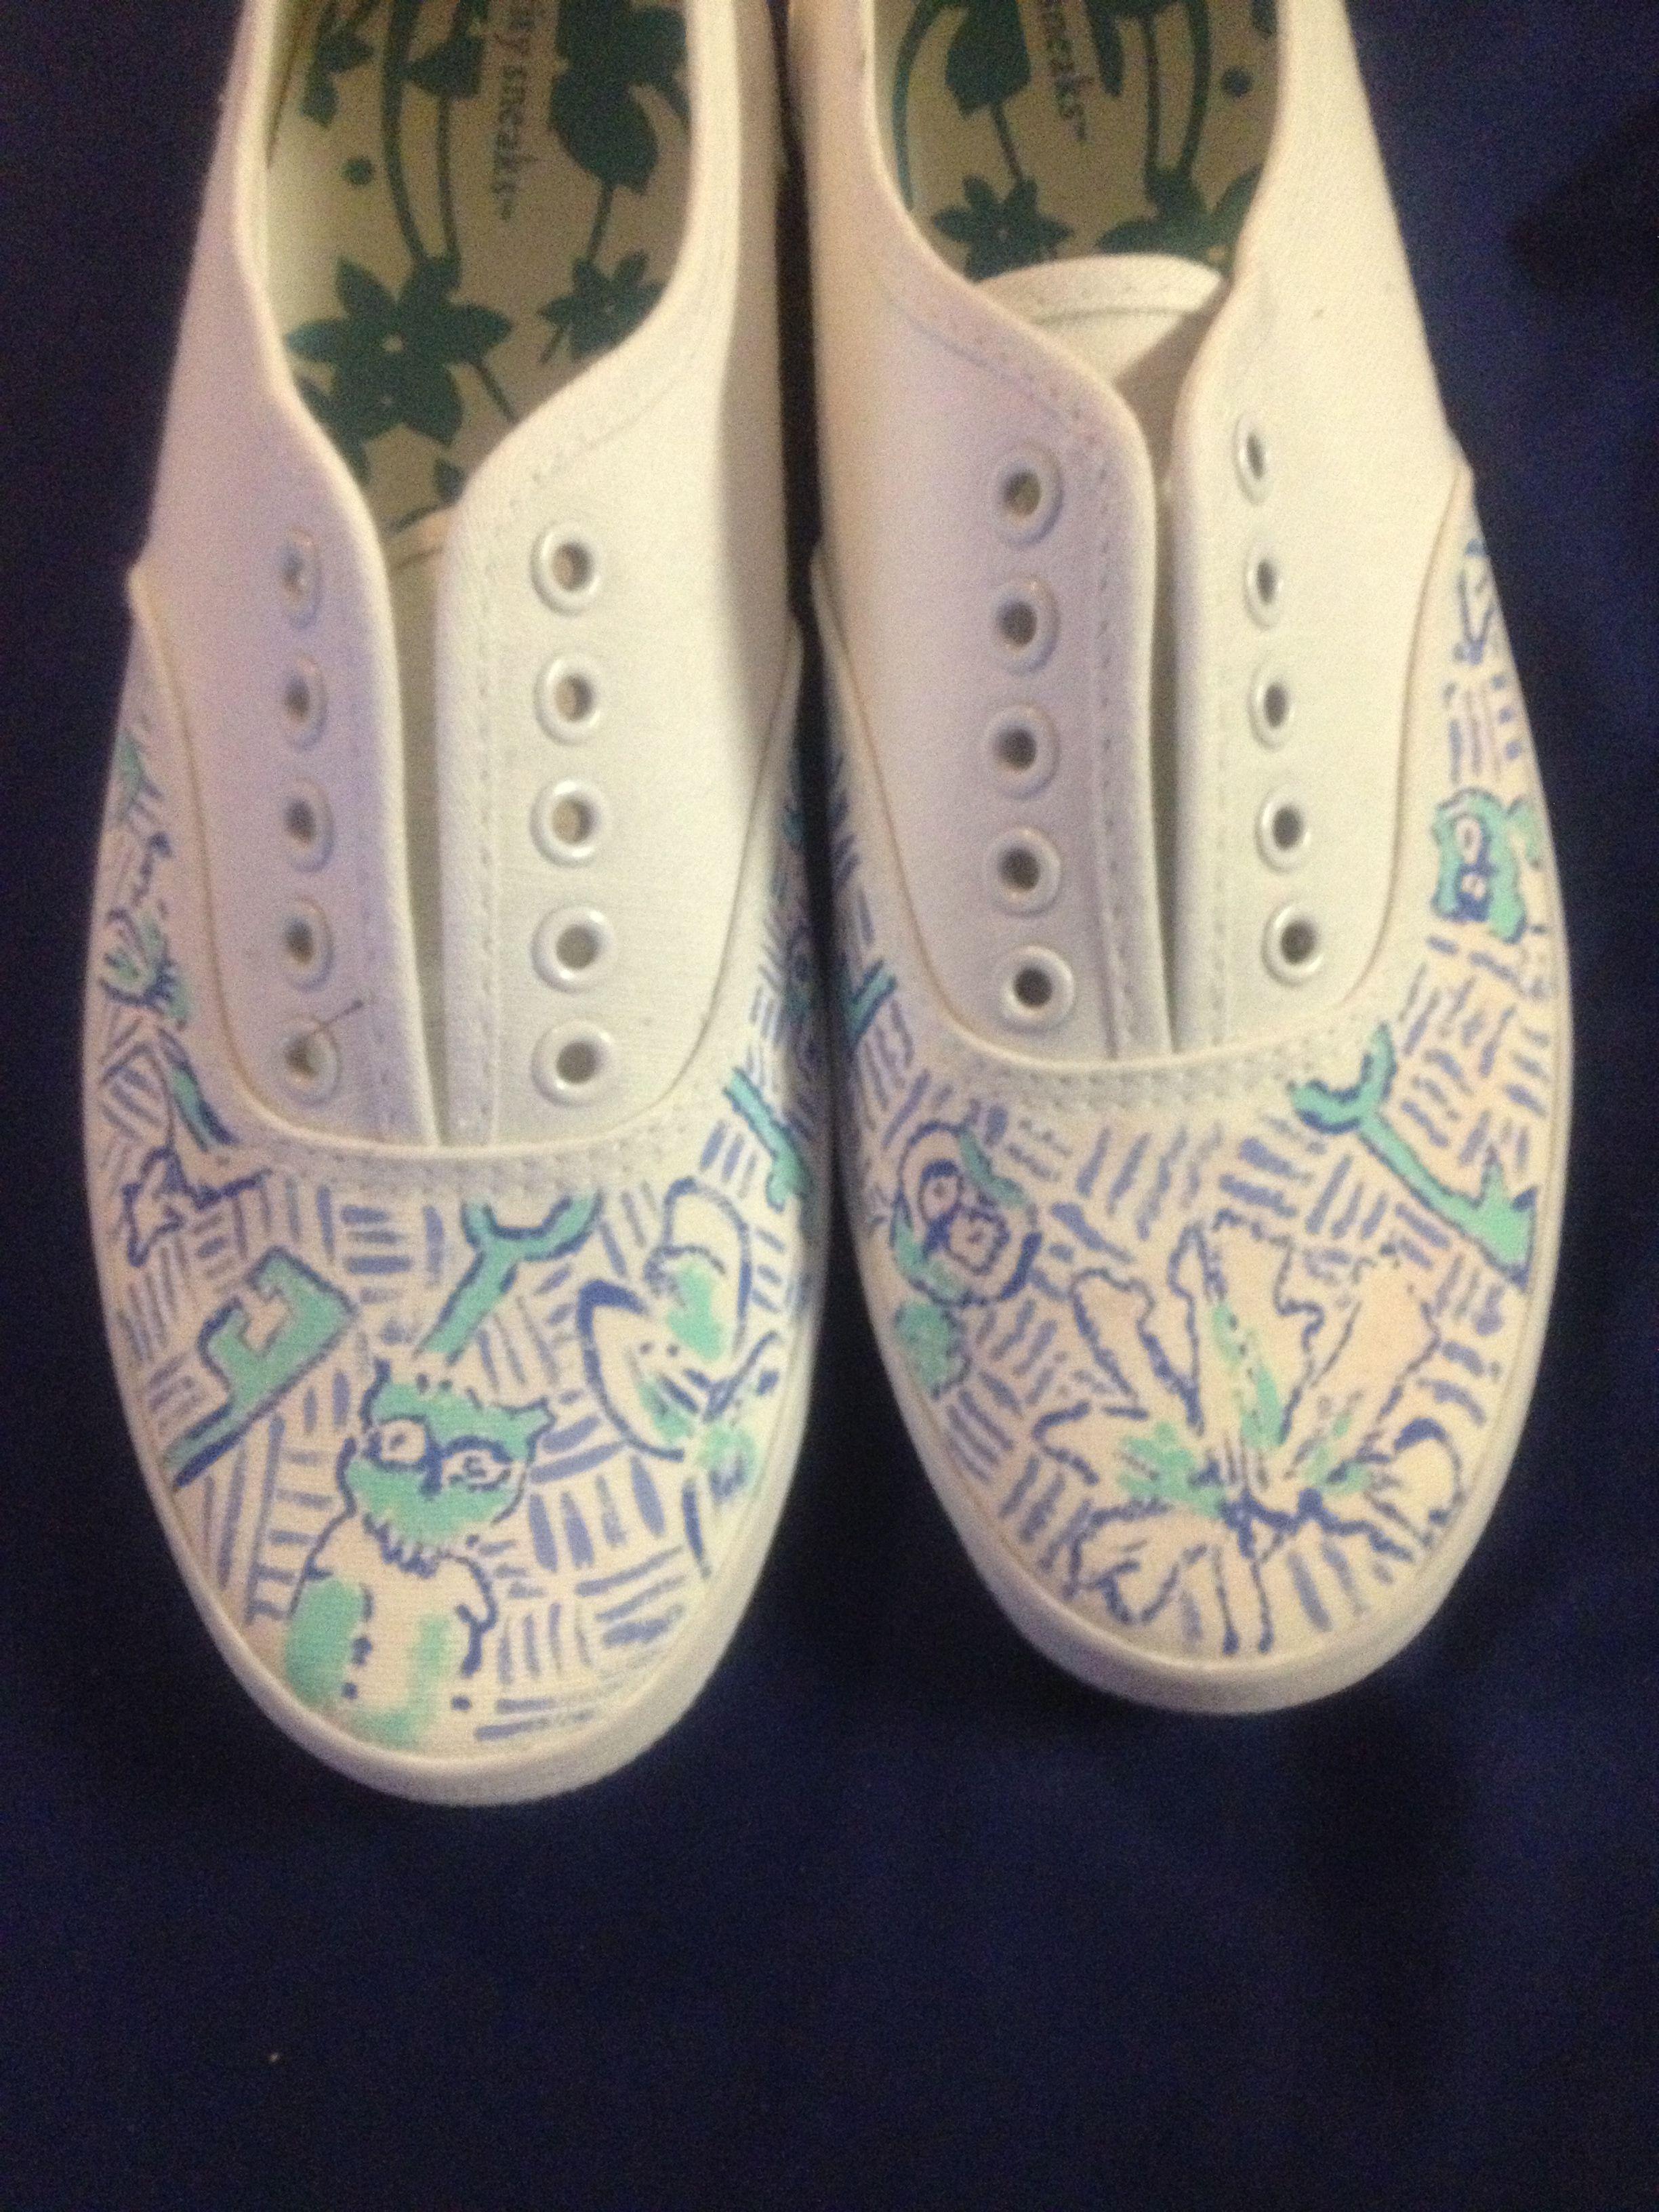 kappa kappa gamma canvas shoes with